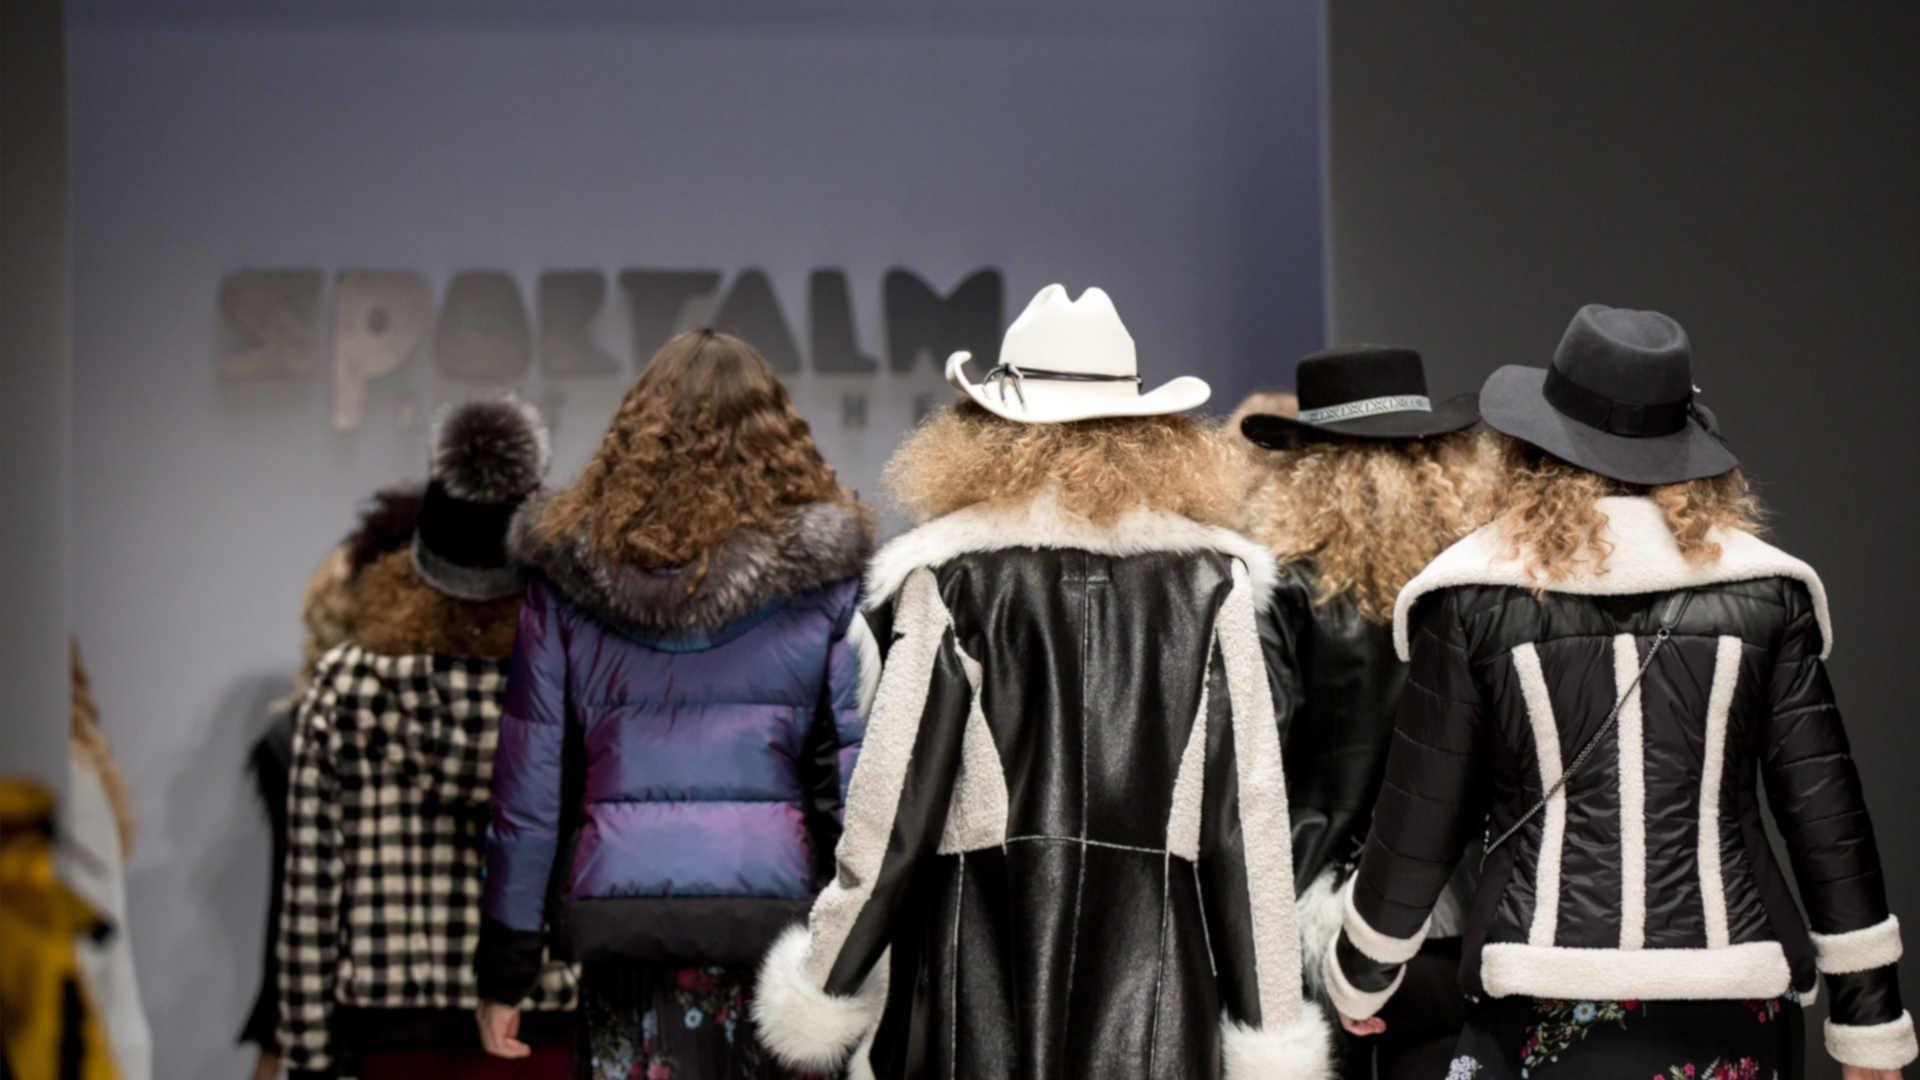 Beauty-Expert-Mercedes-Benz-Fashion-Week-Berlin-Ark-Argenta-1